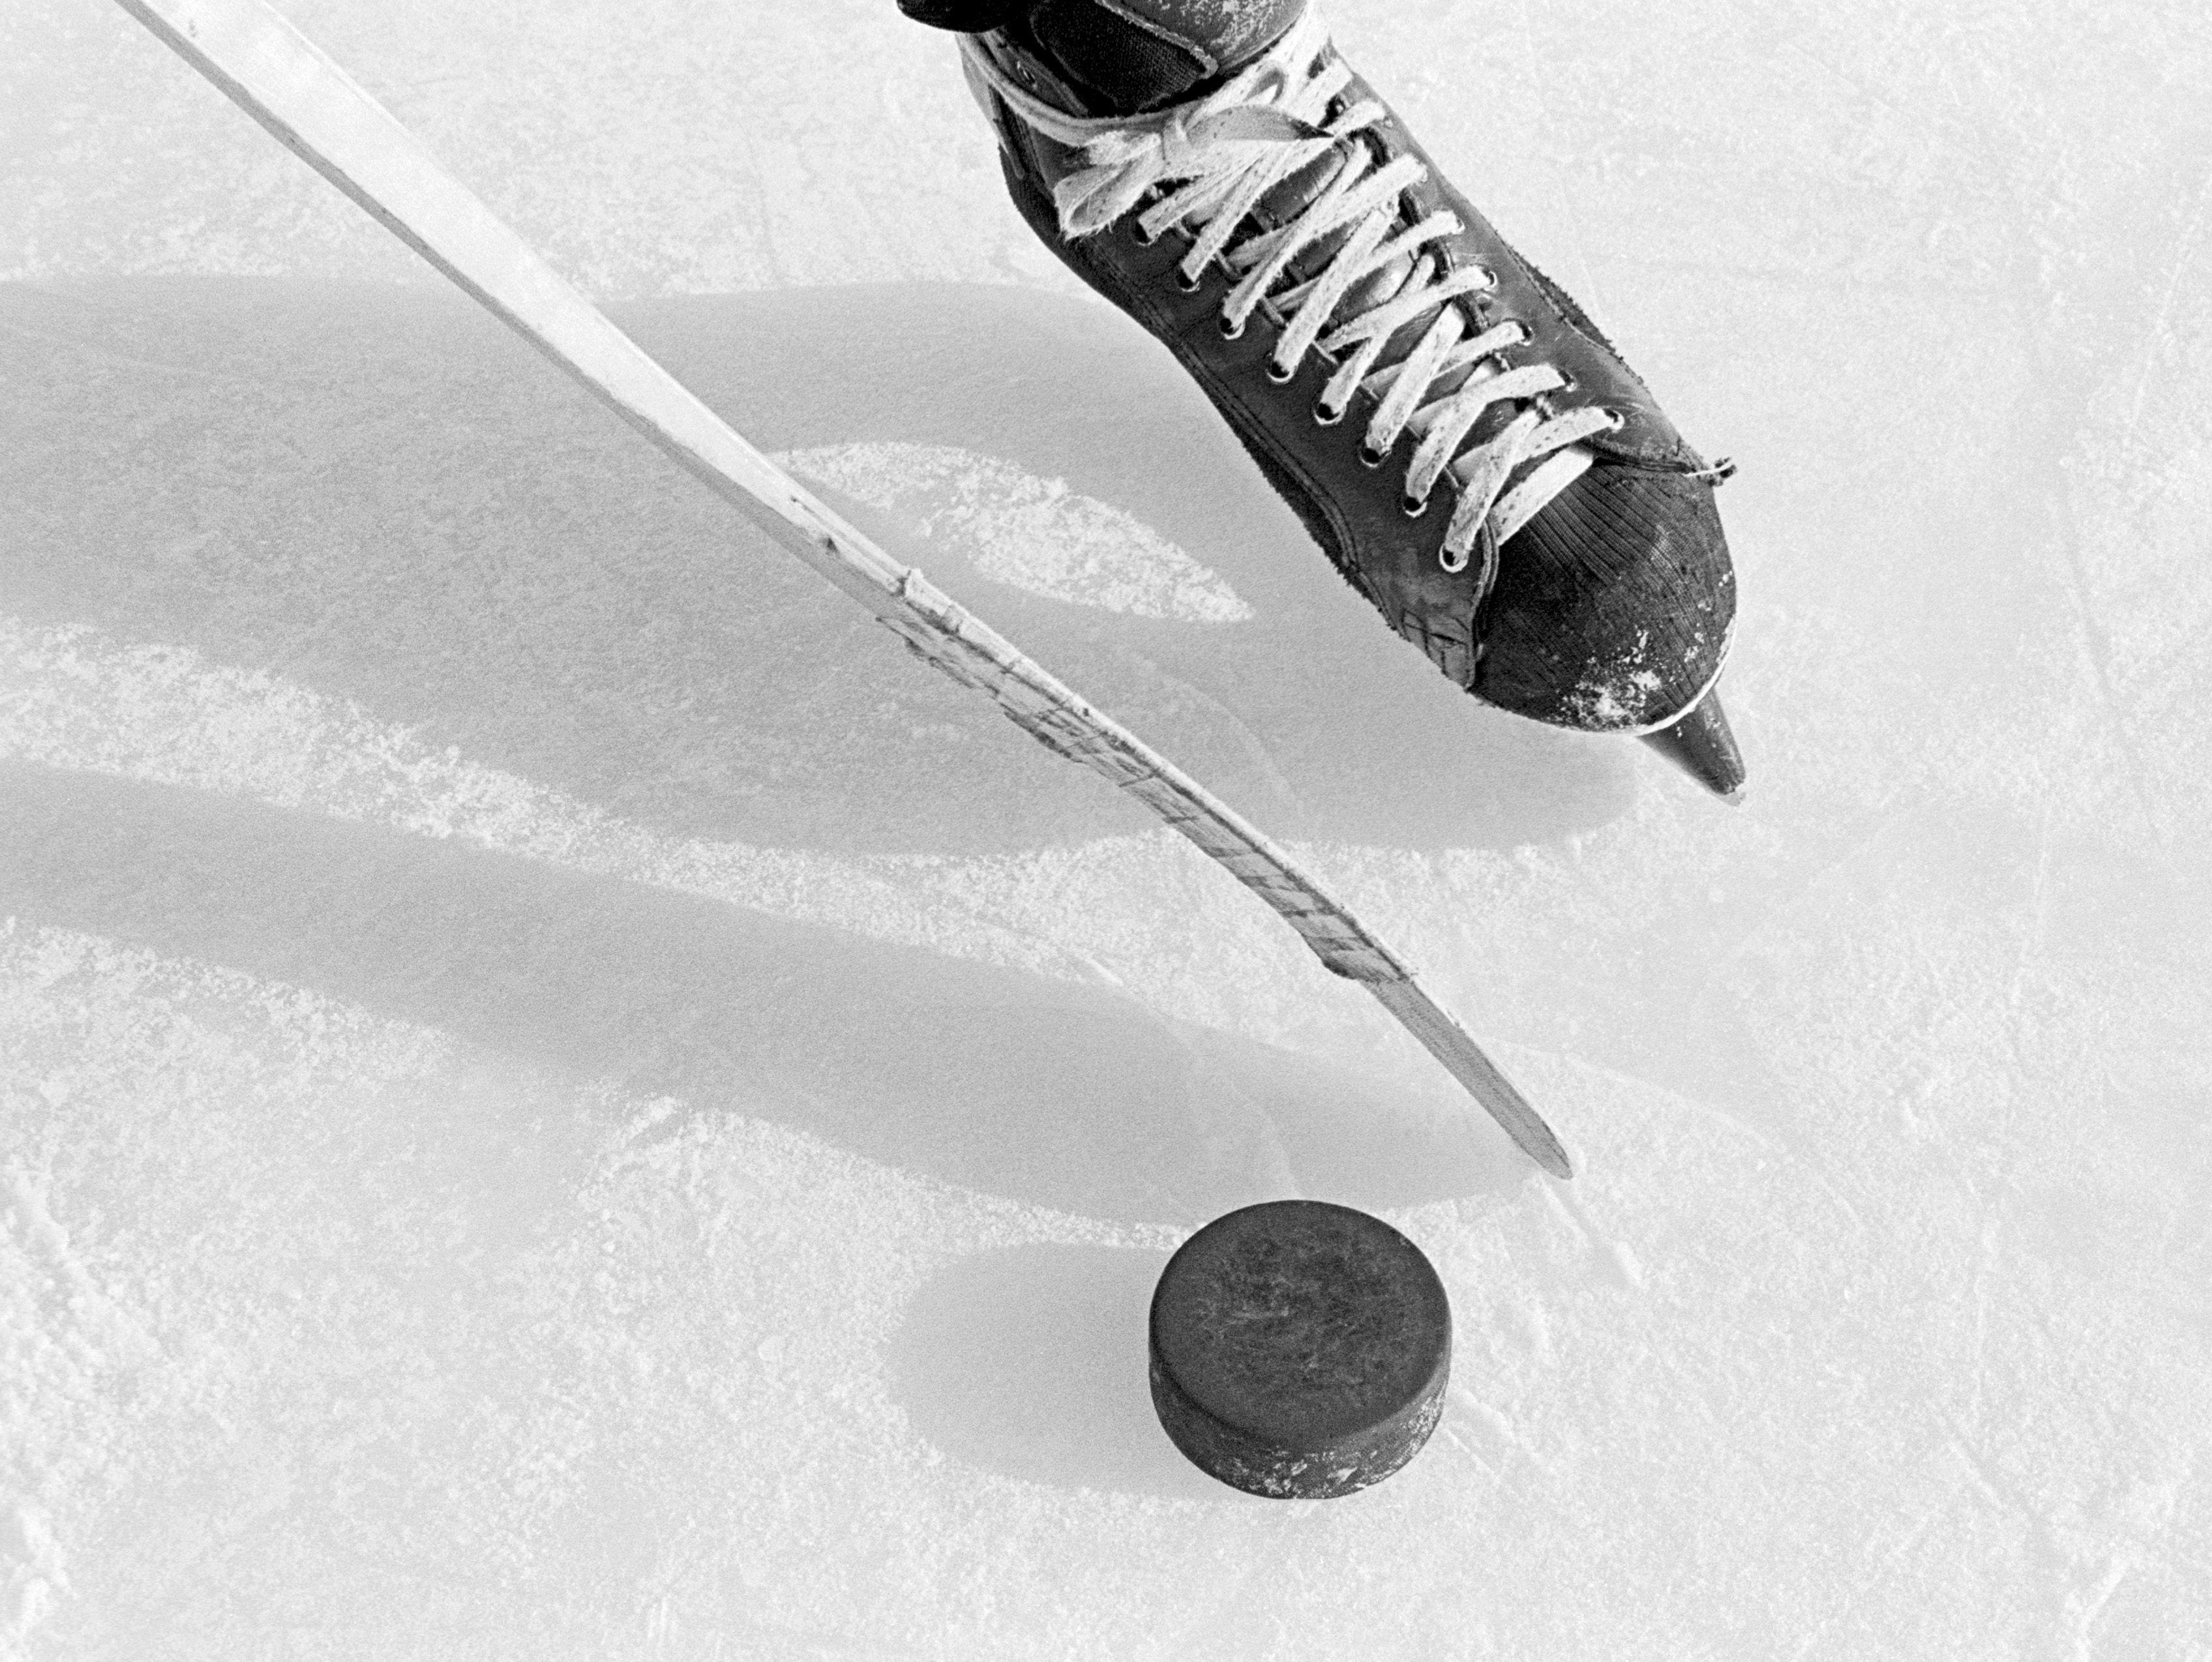 Hockey file photo